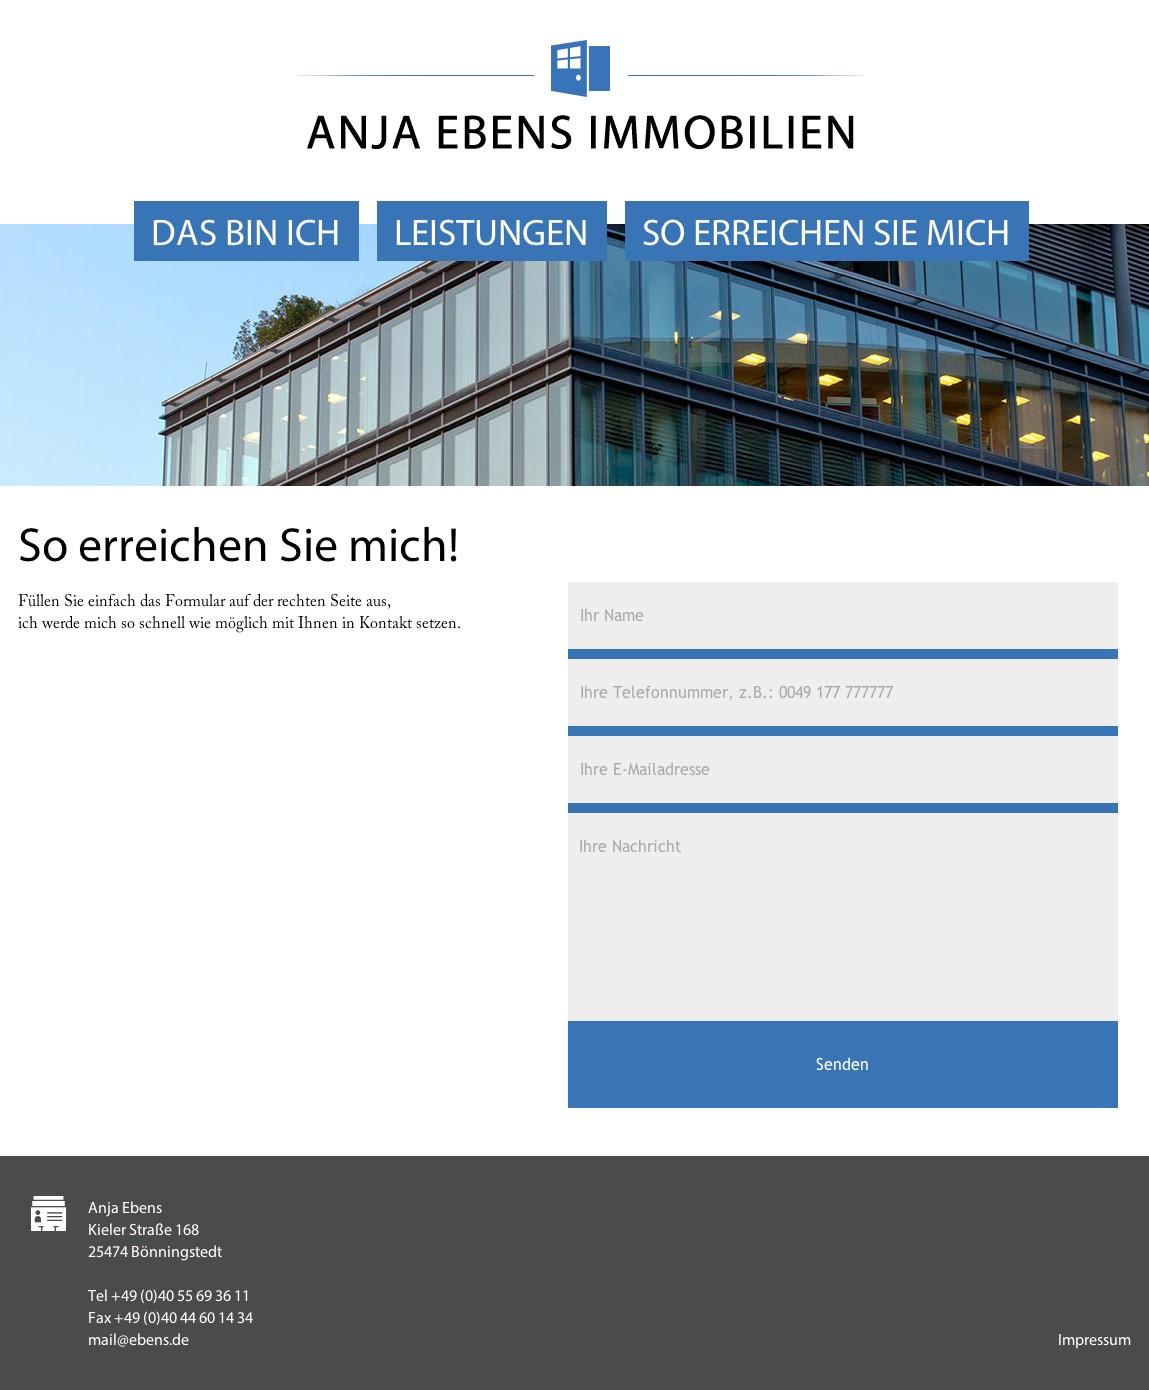 Anja-Ebens-·-Immobilien